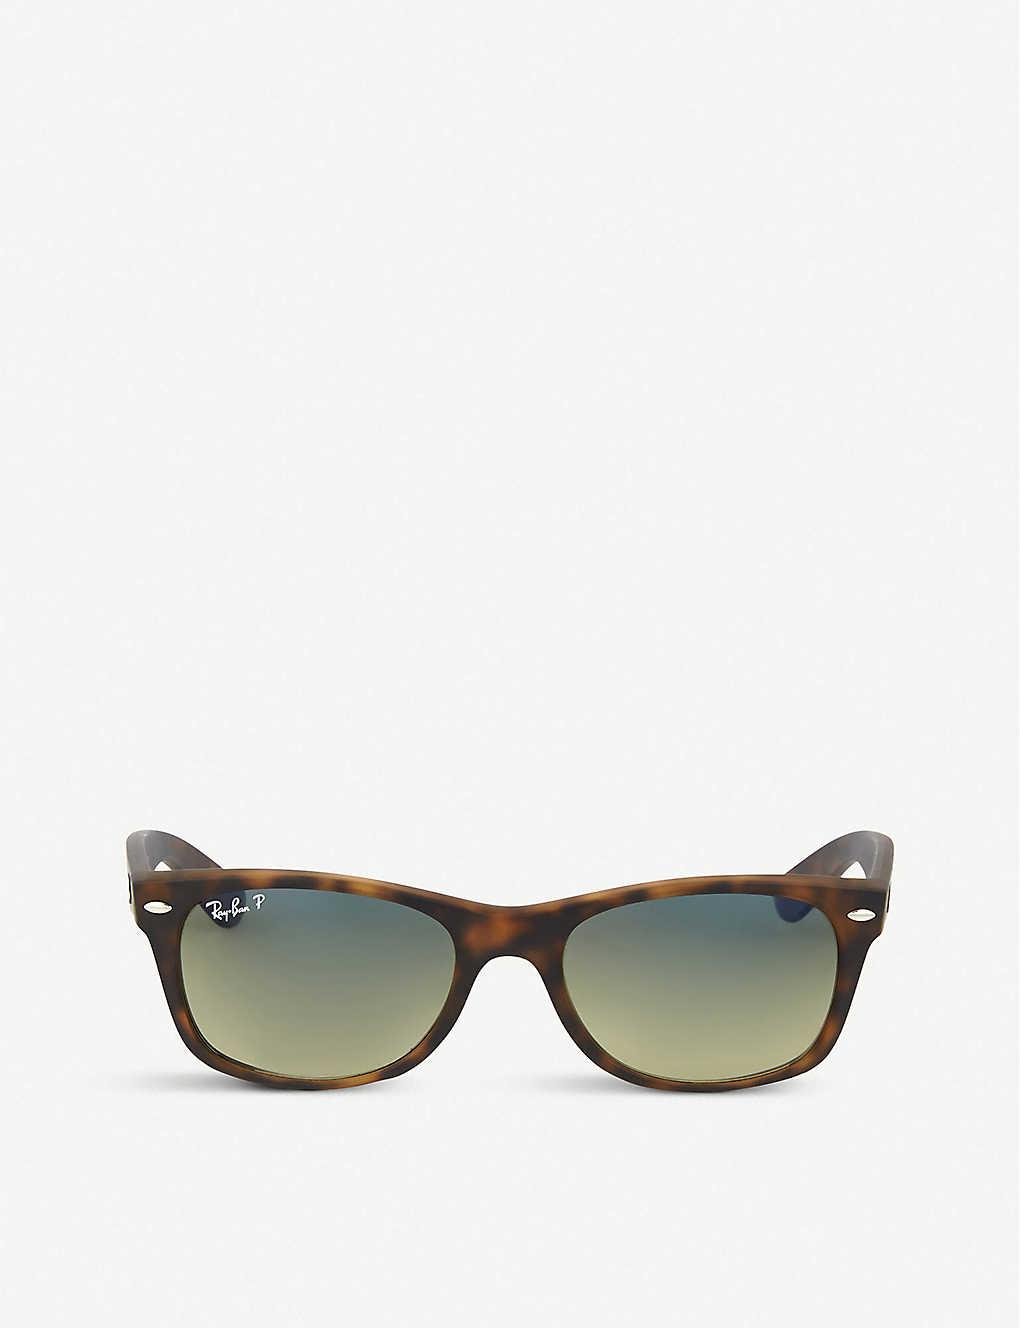 0f8ecd4690bbf RAY-BAN - Tortoiseshell matte finish wayfarer sunglasses RB2132 52 ...